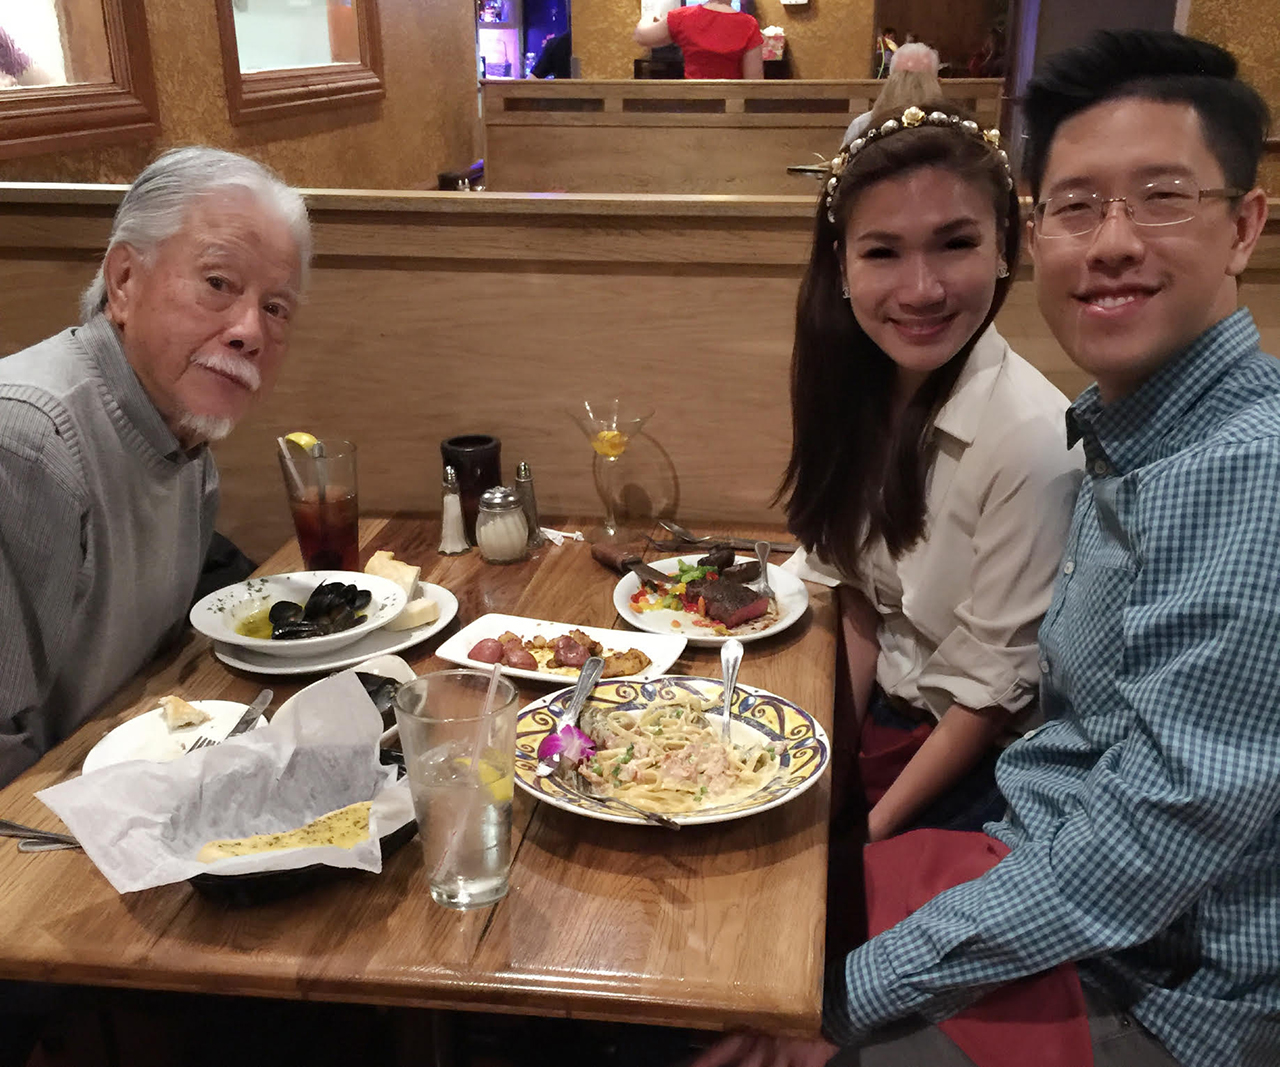 Dinner at Papa Joe's